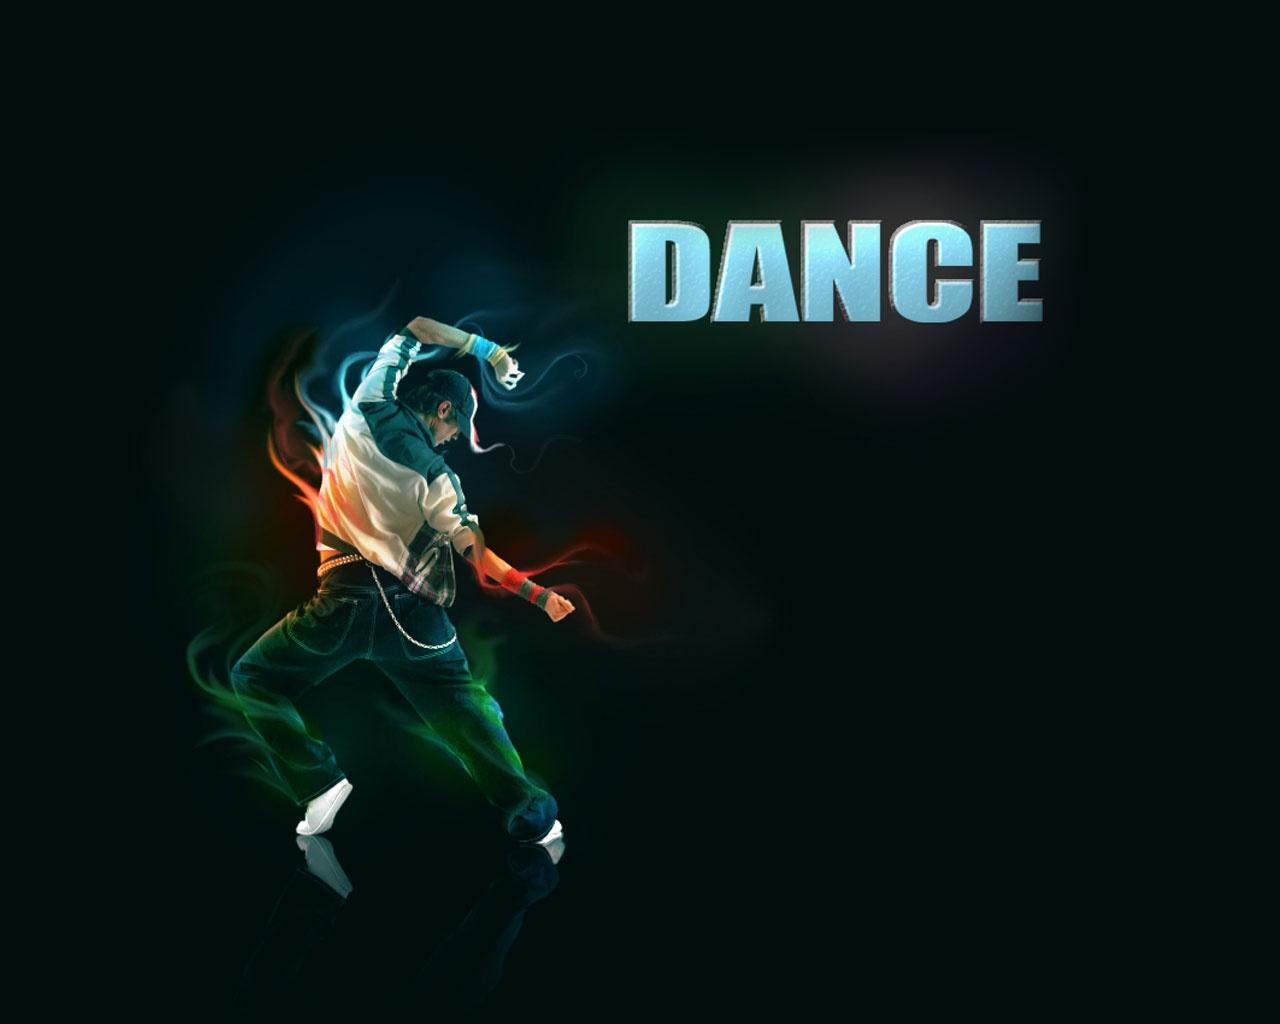 http://2.bp.blogspot.com/-MhblPRgla-U/TV_YBosEZ_I/AAAAAAAABXc/u_31kh1Wy3Q/s1600/dance_maniacs-1280x1024.jpg